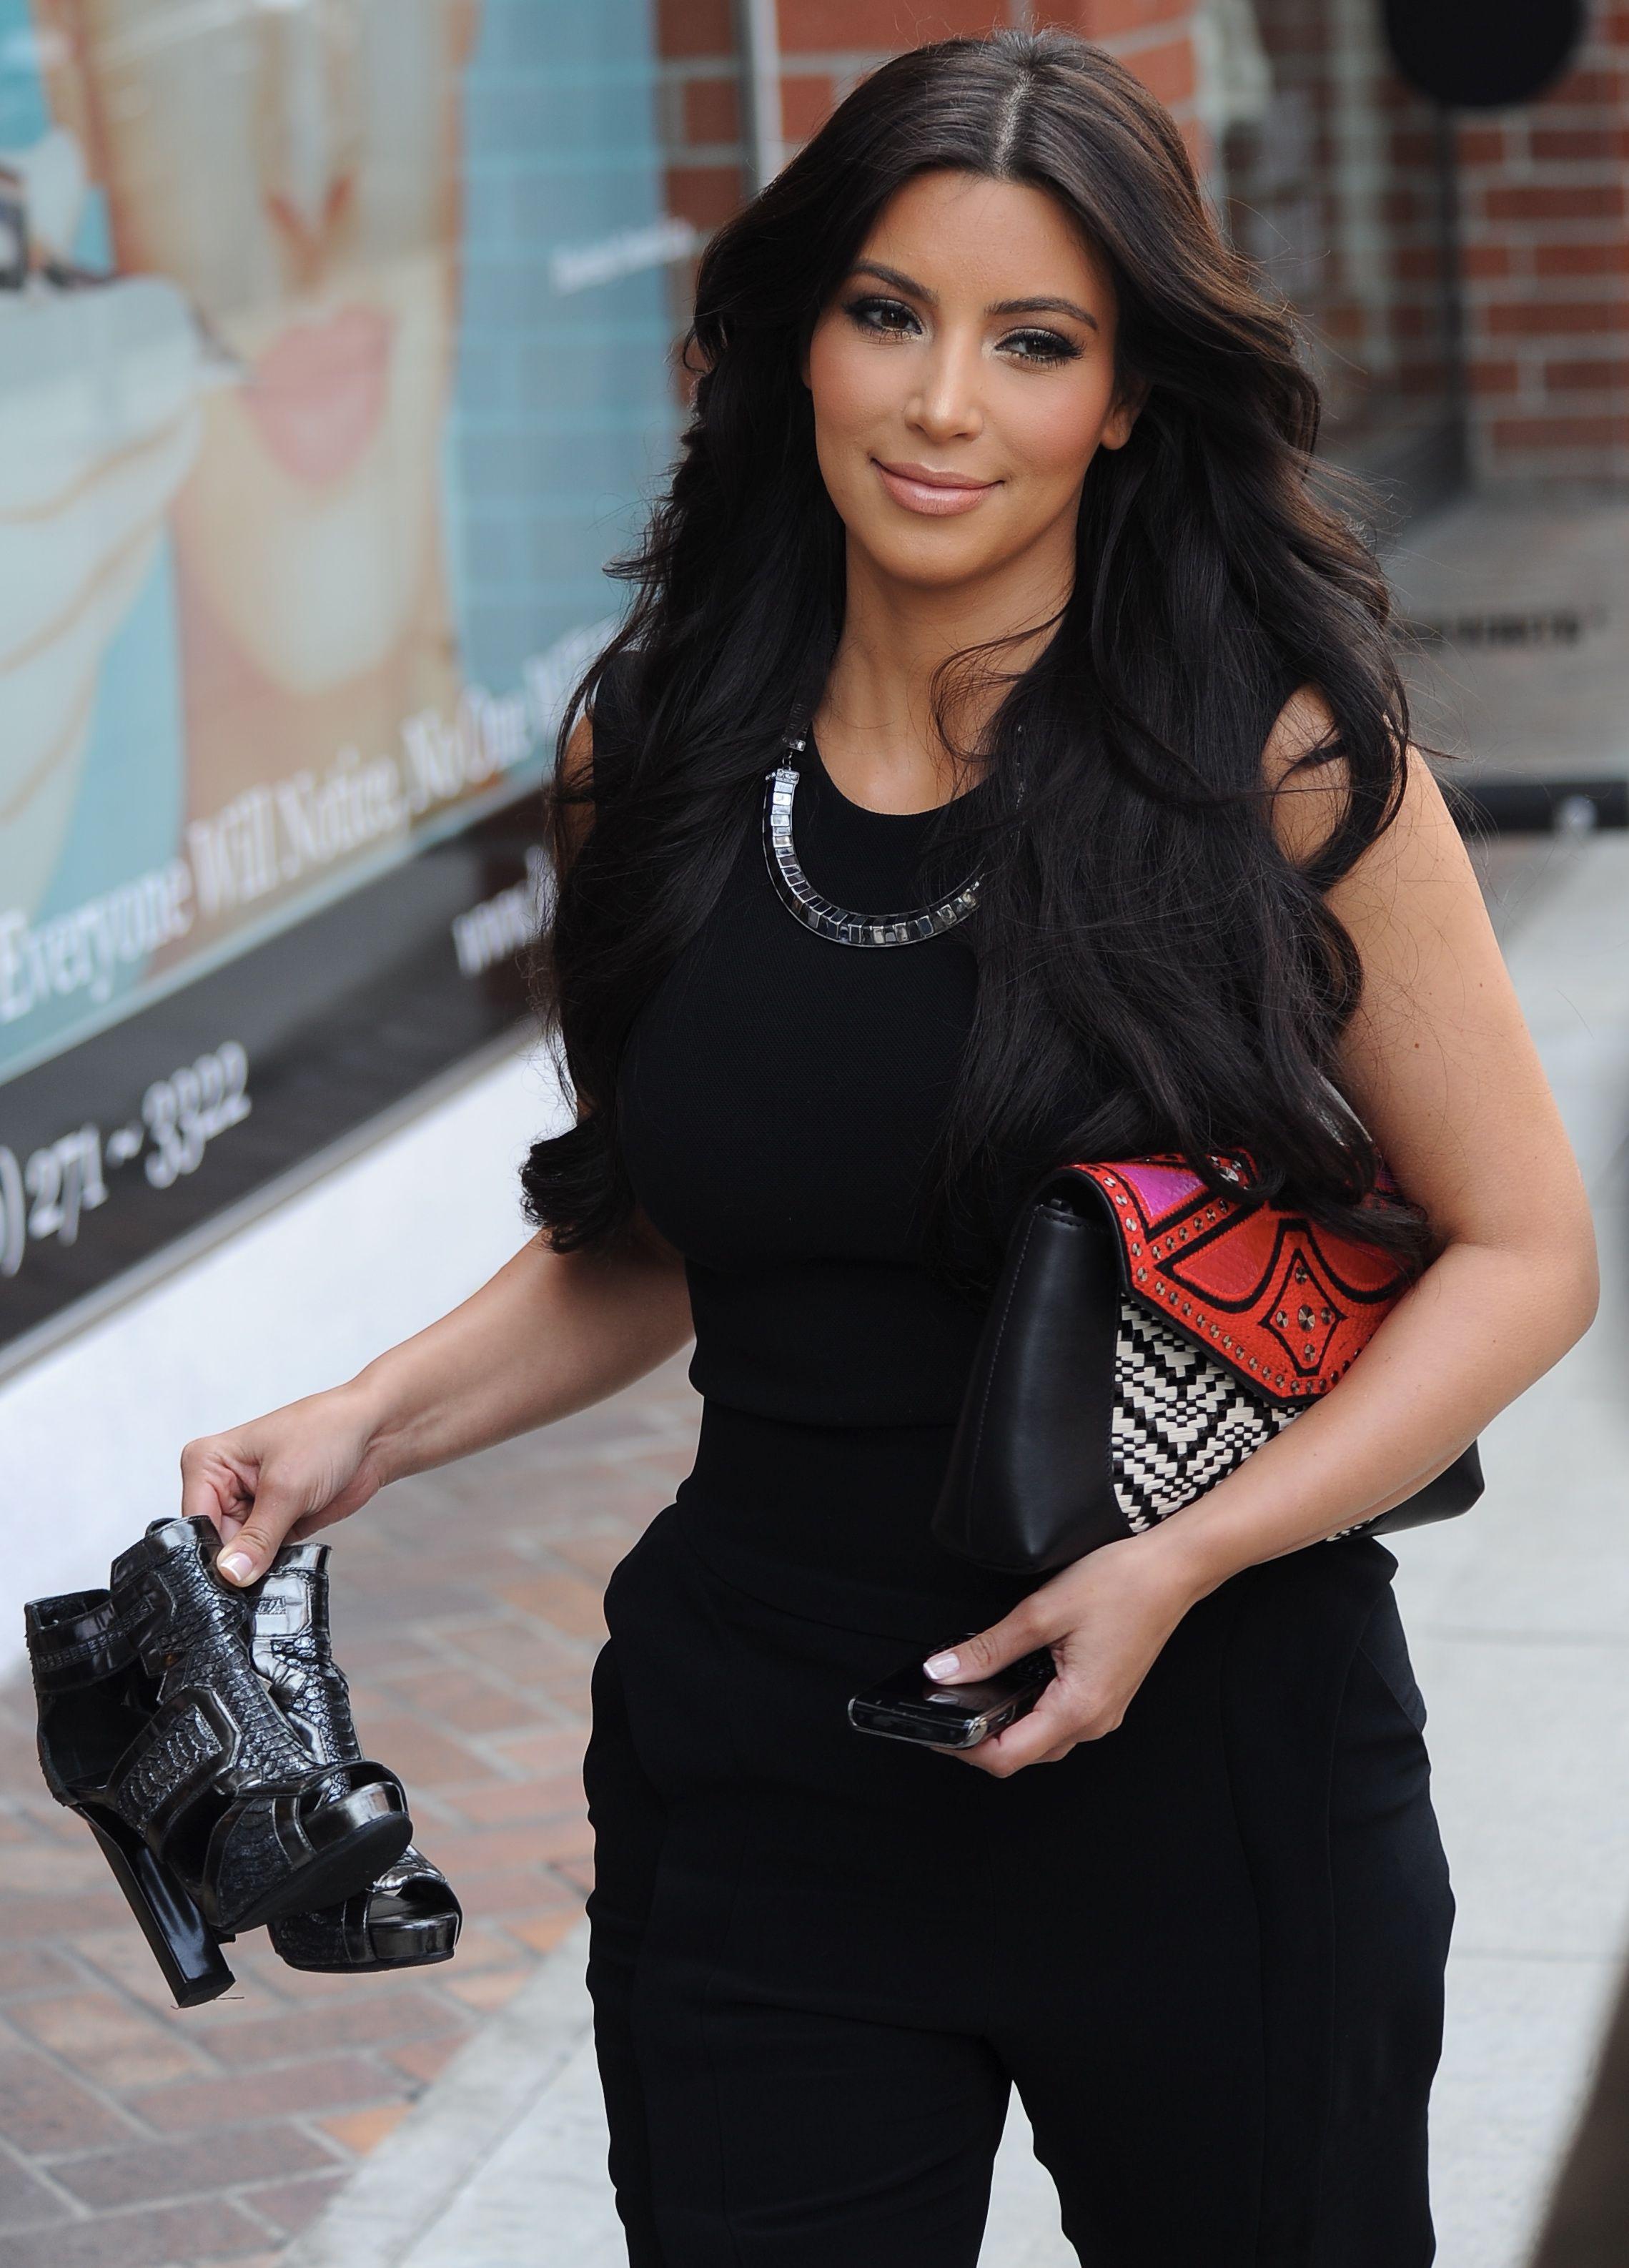 Pin by sxkanabar on Old school kimmy  Pinterest  Kardashian Kim